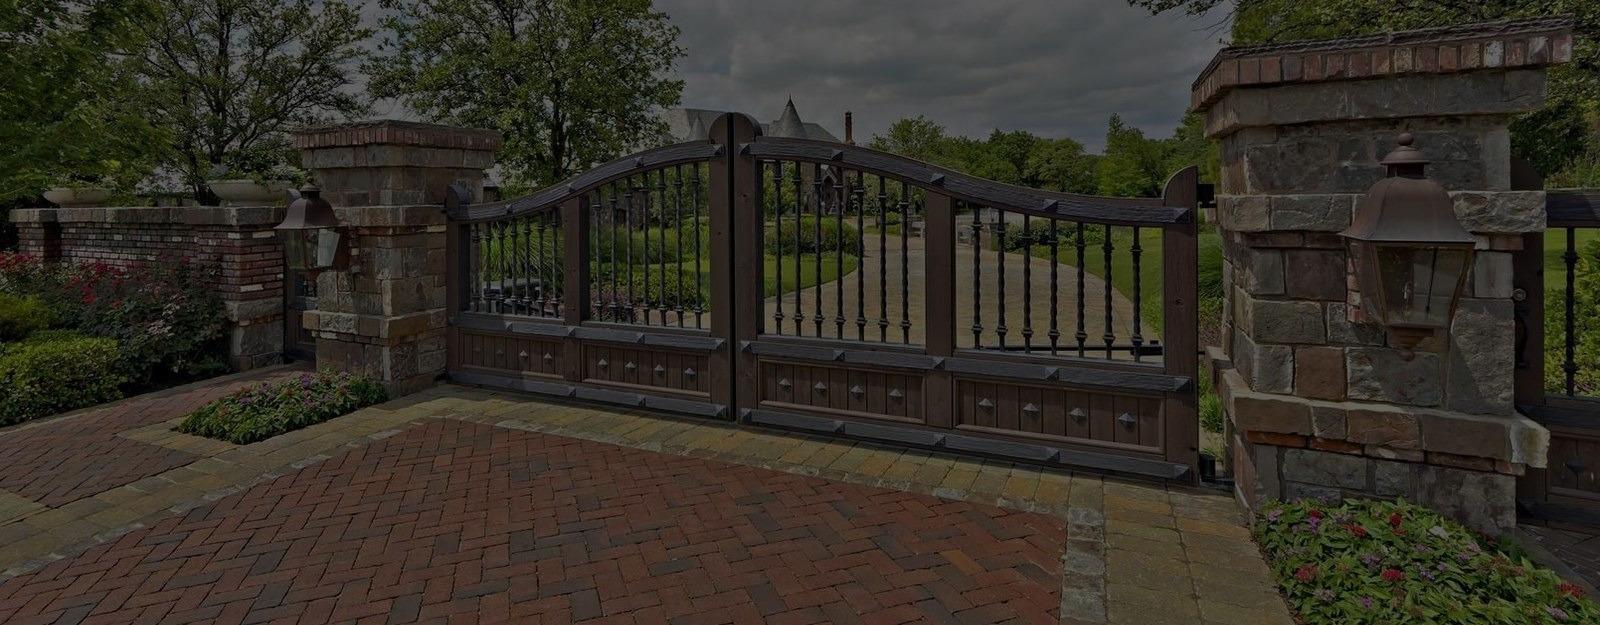 Automatic Gate Repair Provo